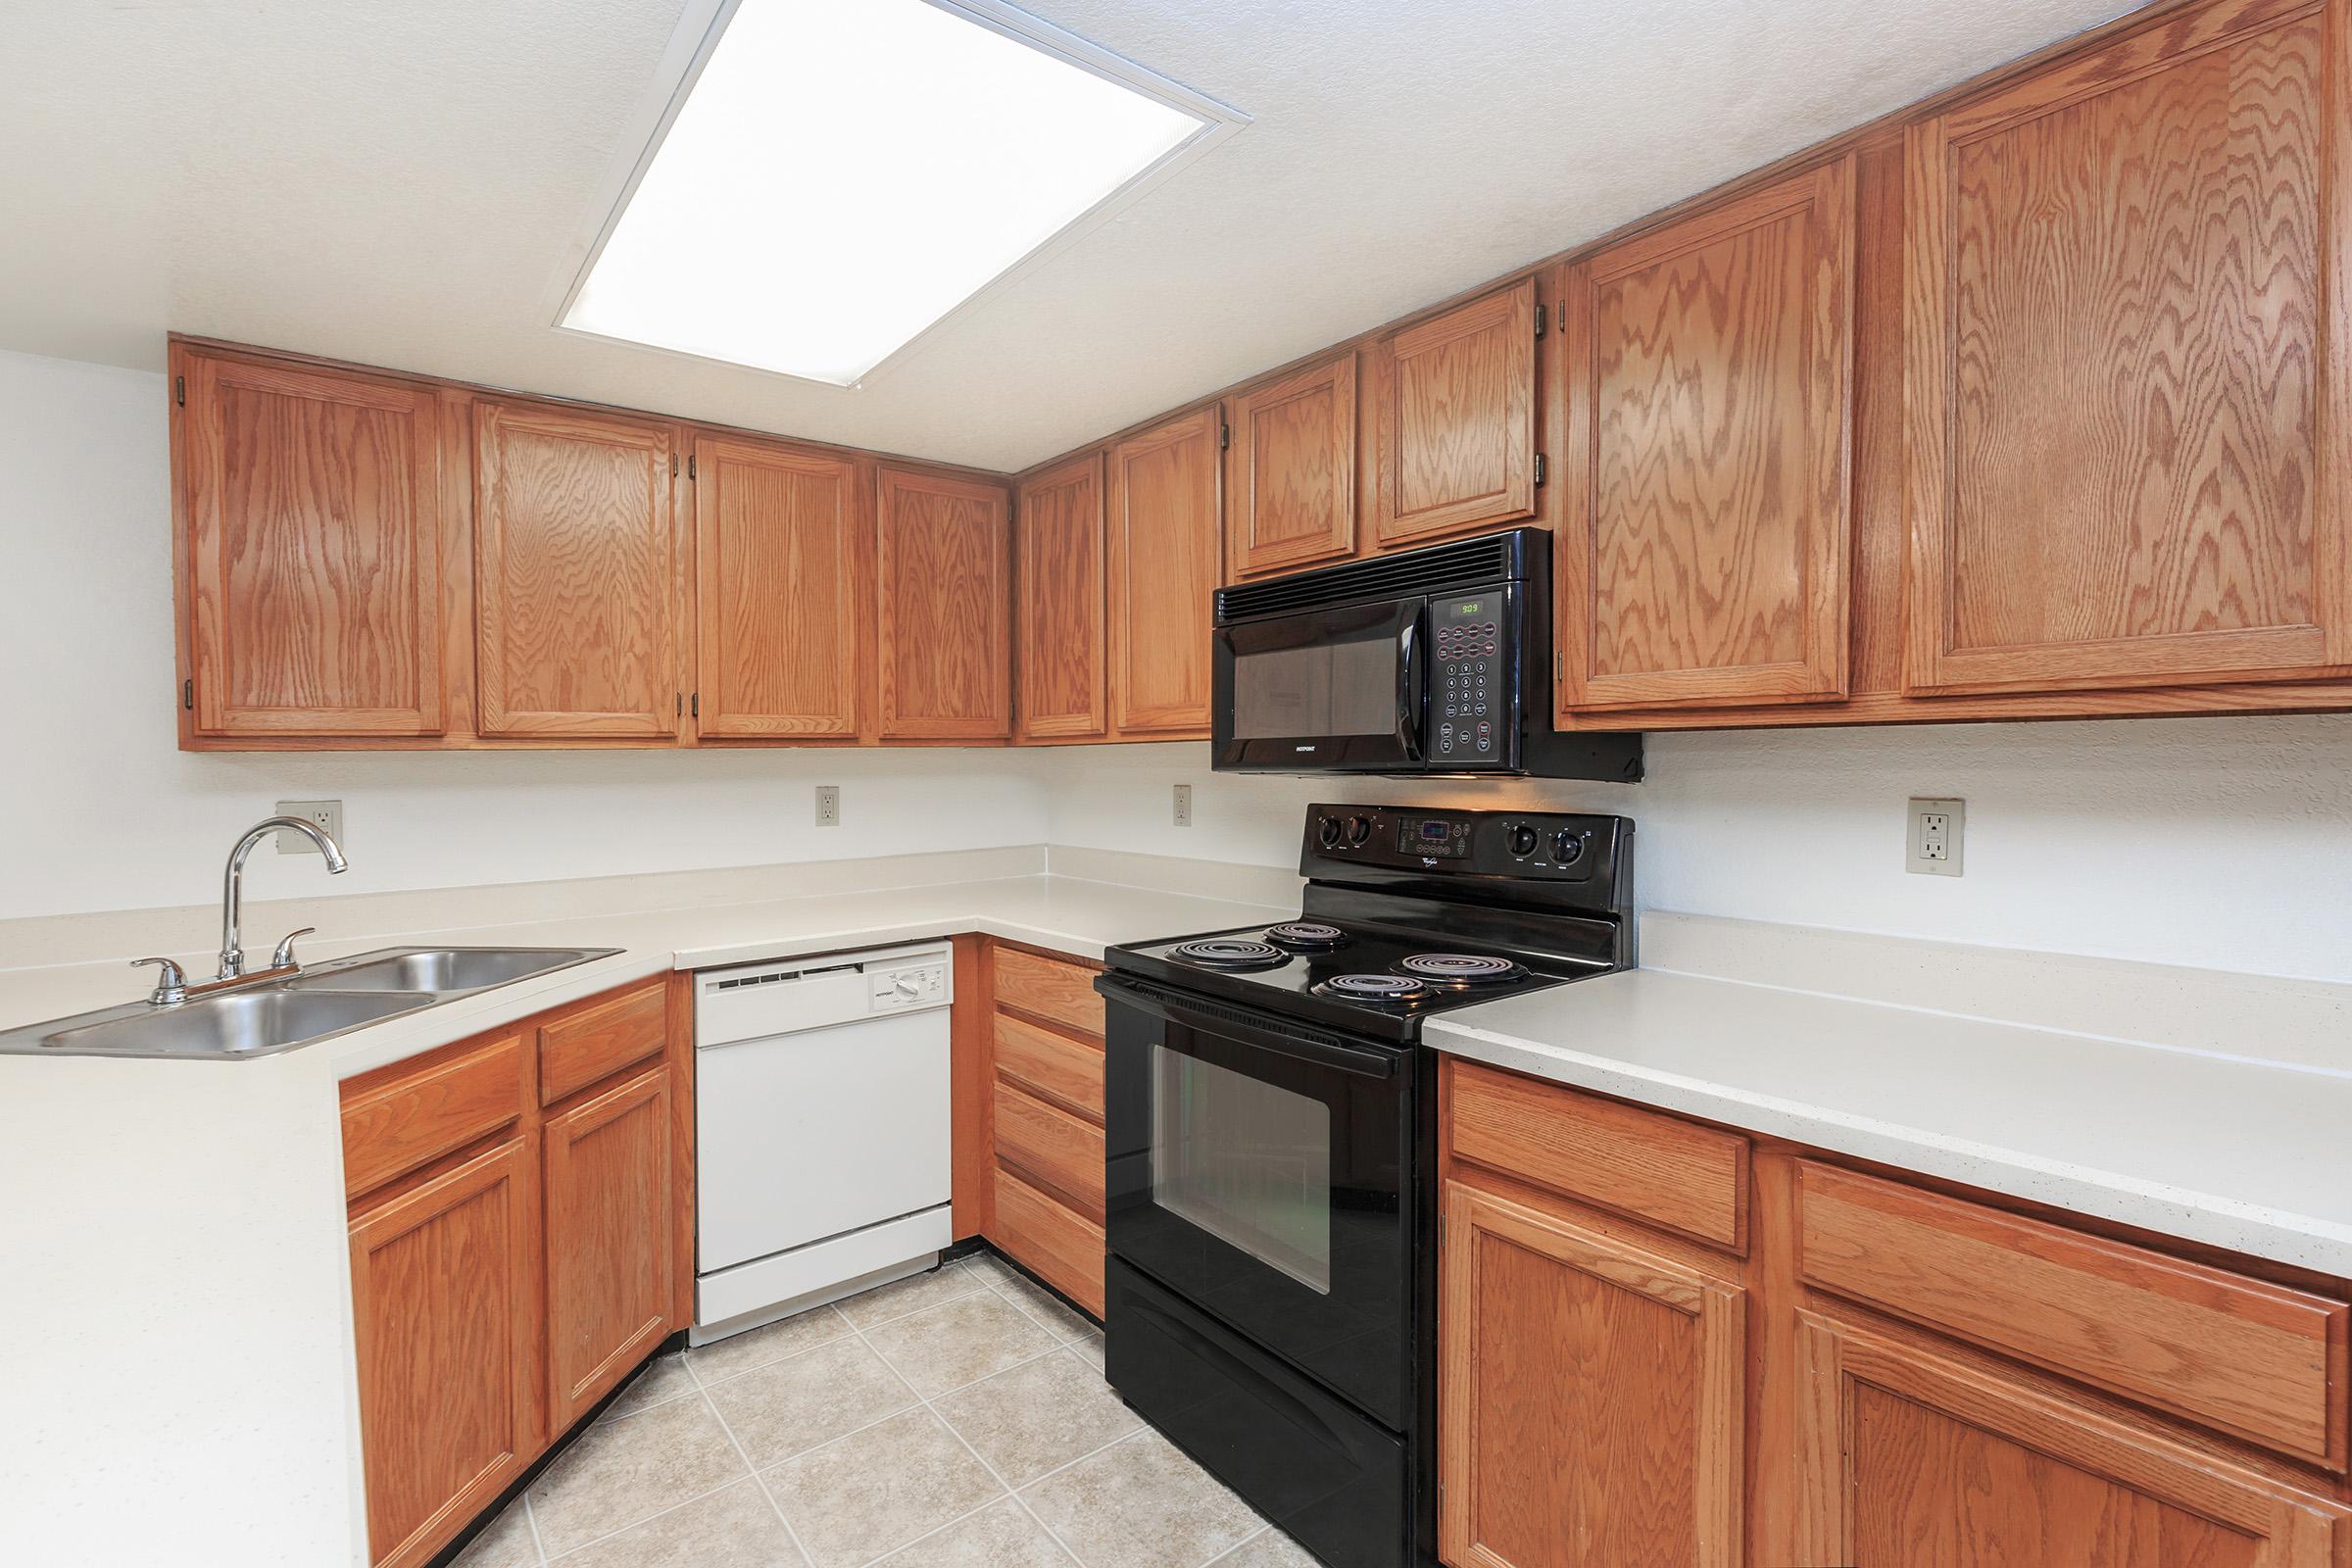 Catalina Crossing - Apartment Homes in Tucson, AZ